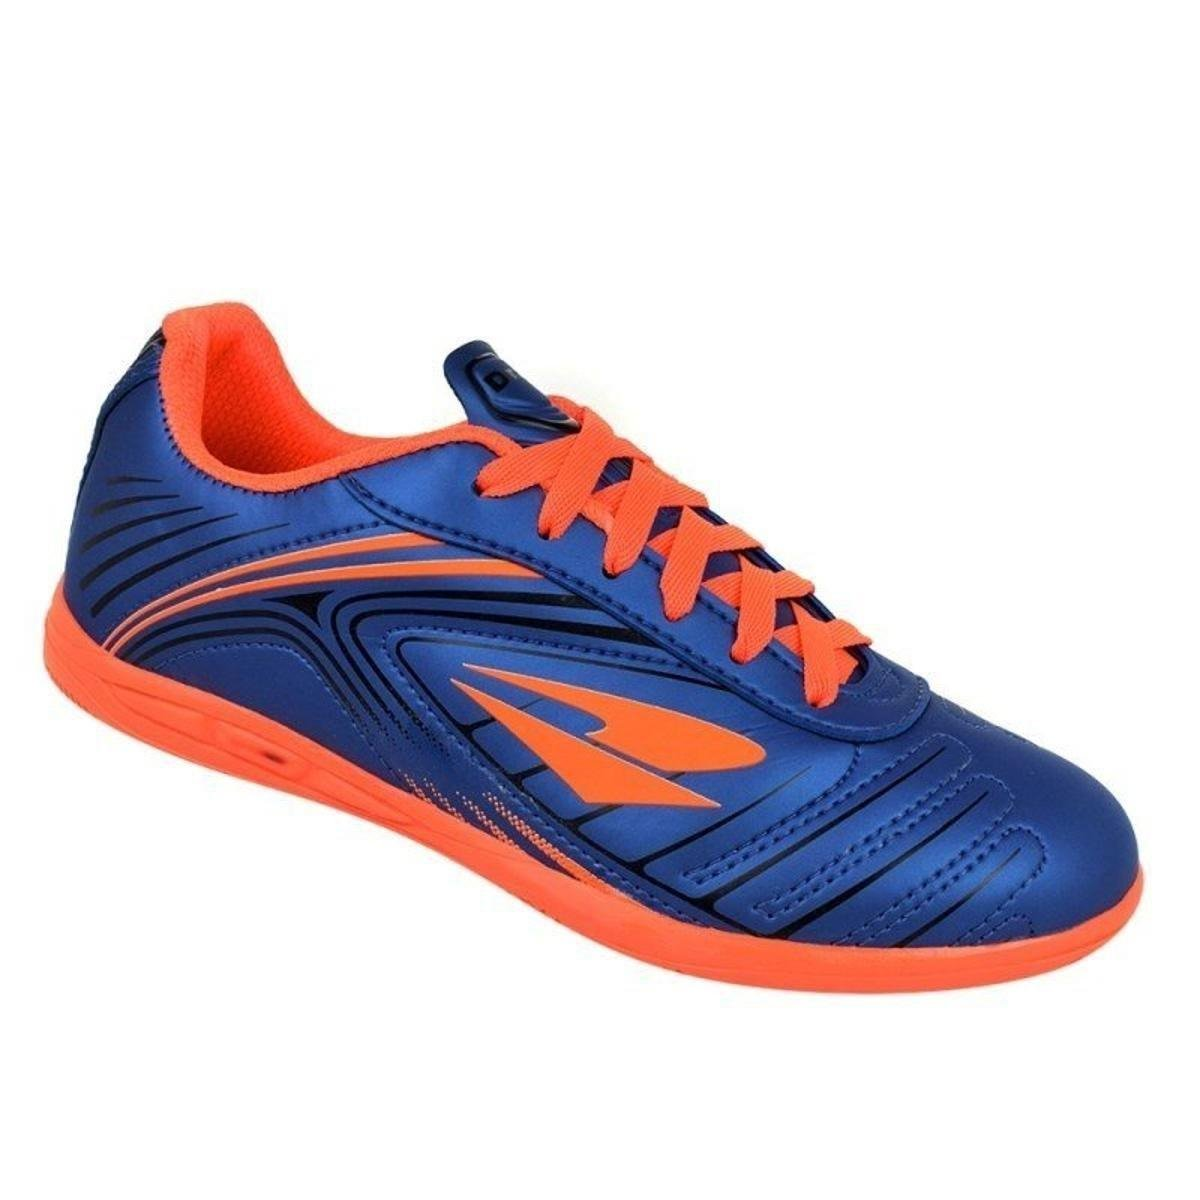 d974c56e89442 Chuteira Futsal Foorcy II Dray Masculina - Compre Agora